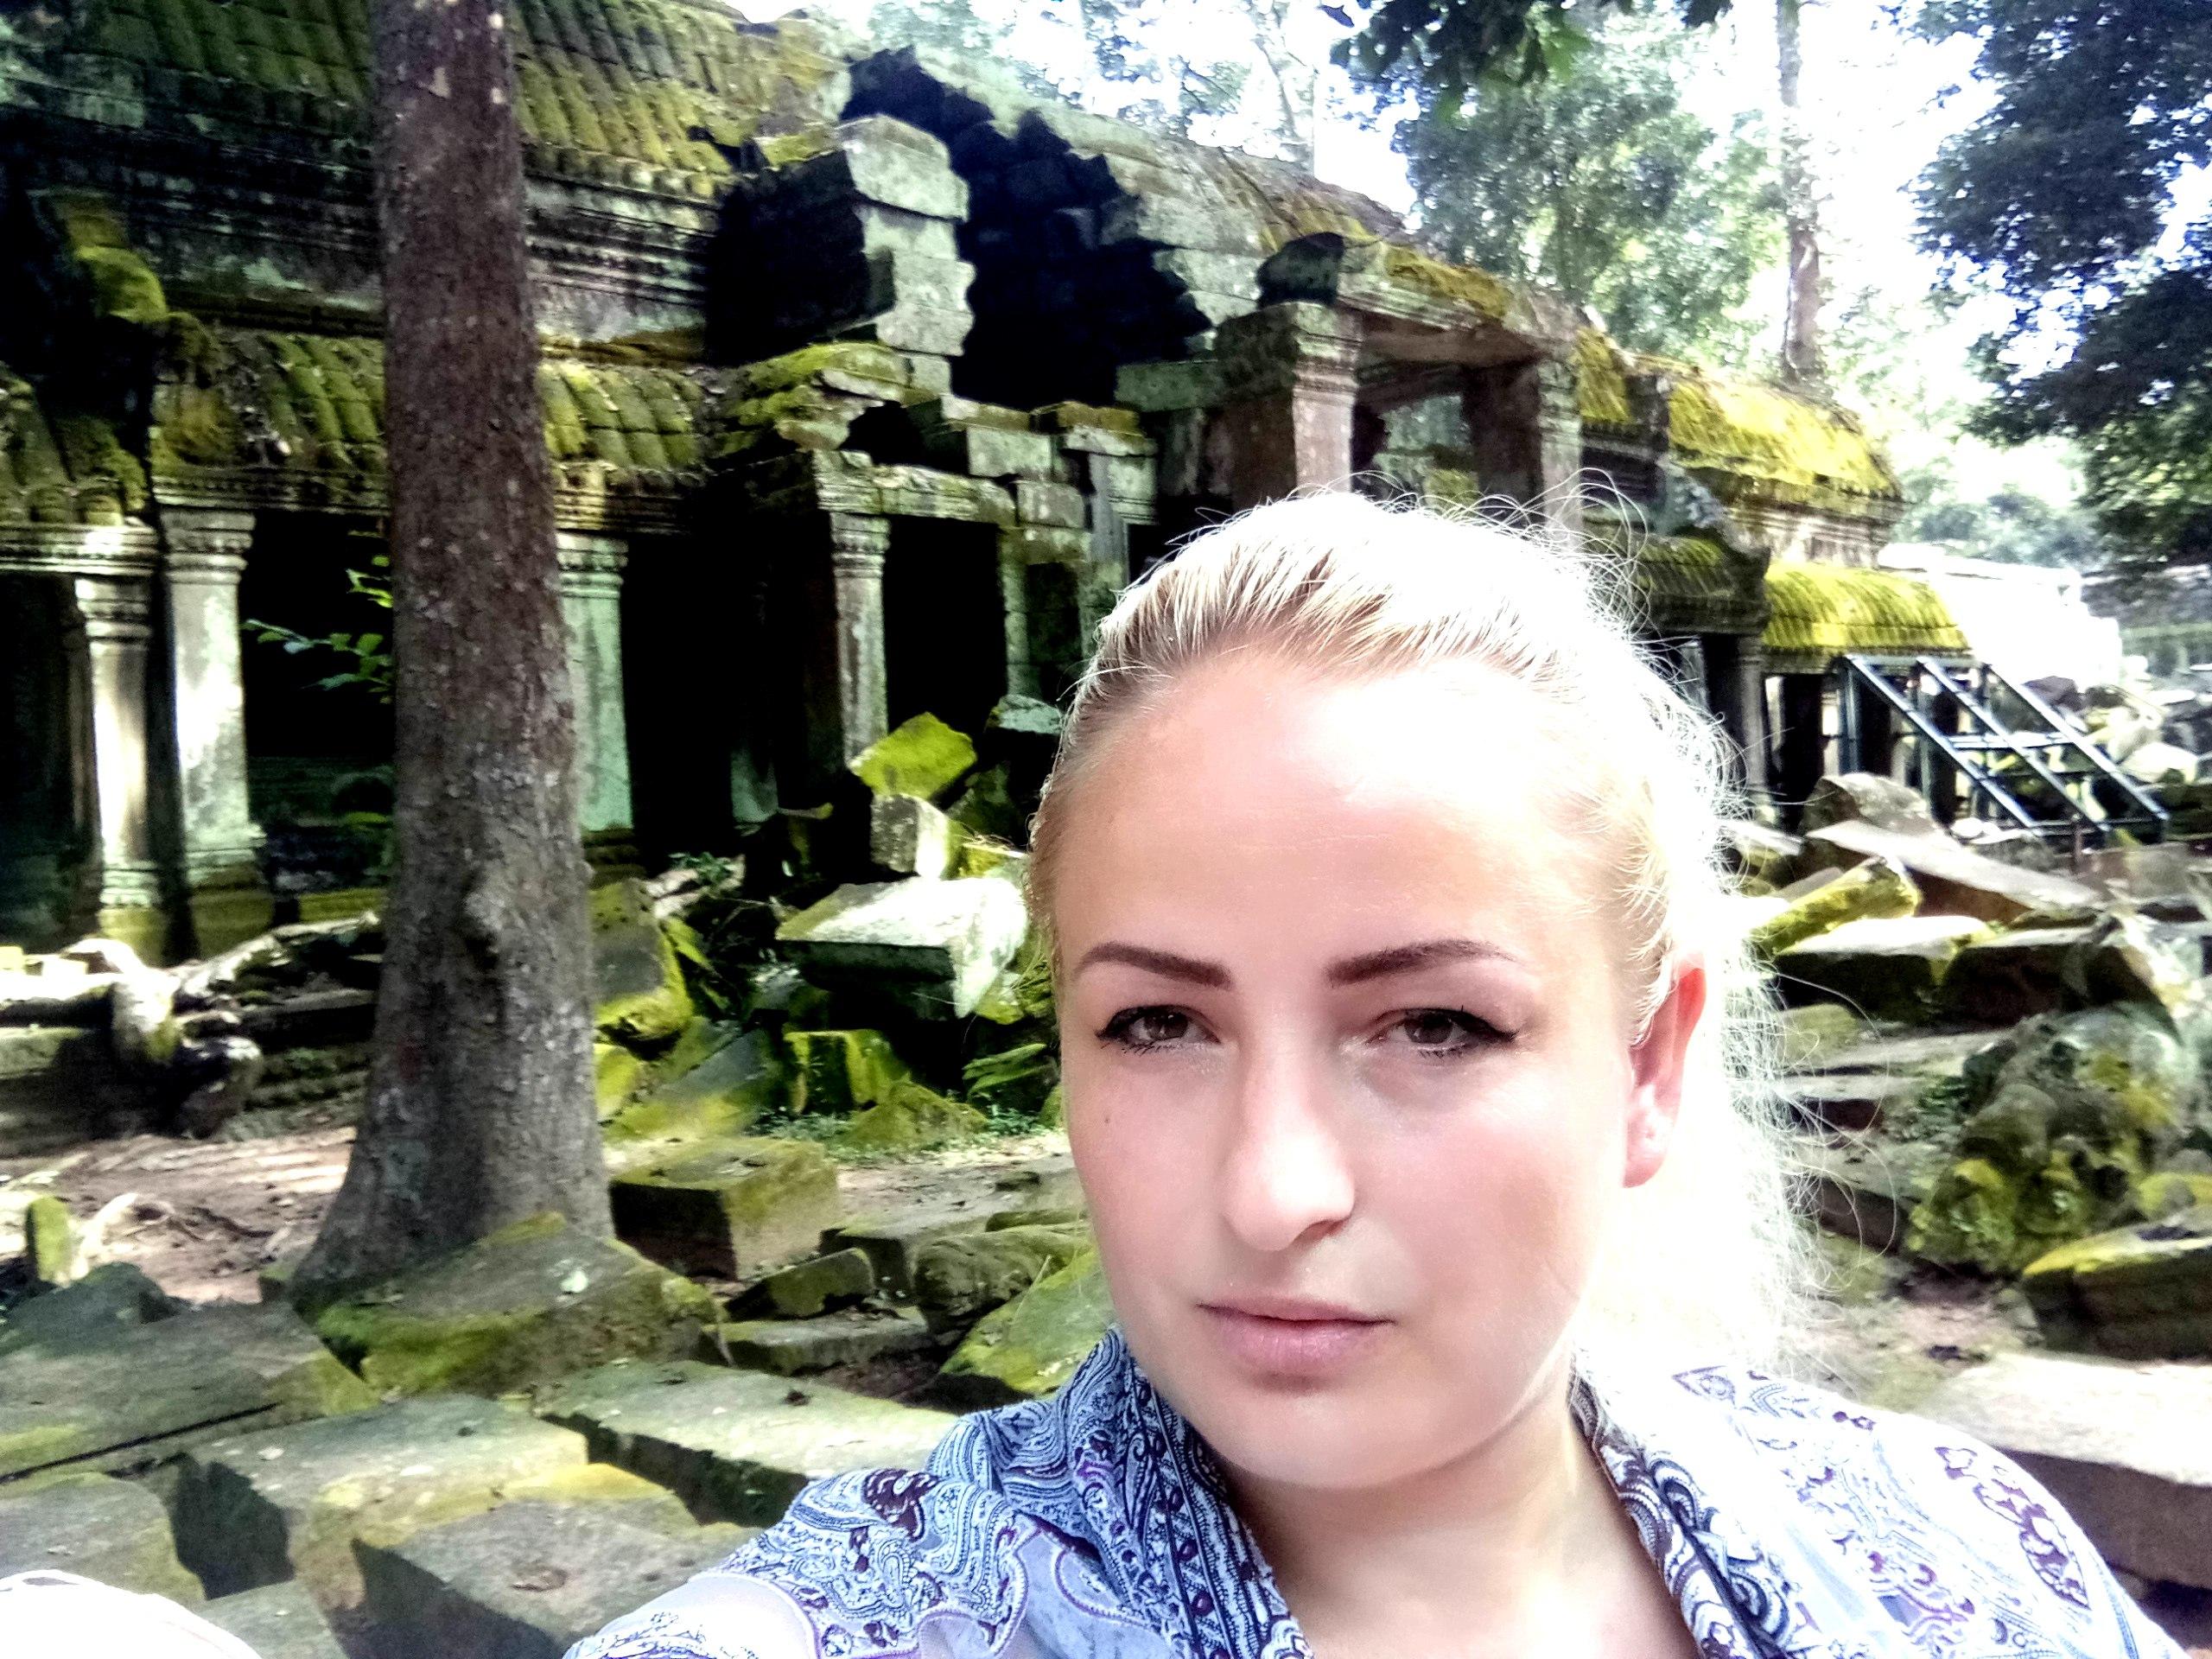 Елена Руденко (Валтея). Камбоджа. Ангкор. - Страница 3 Nutw-VOglMs